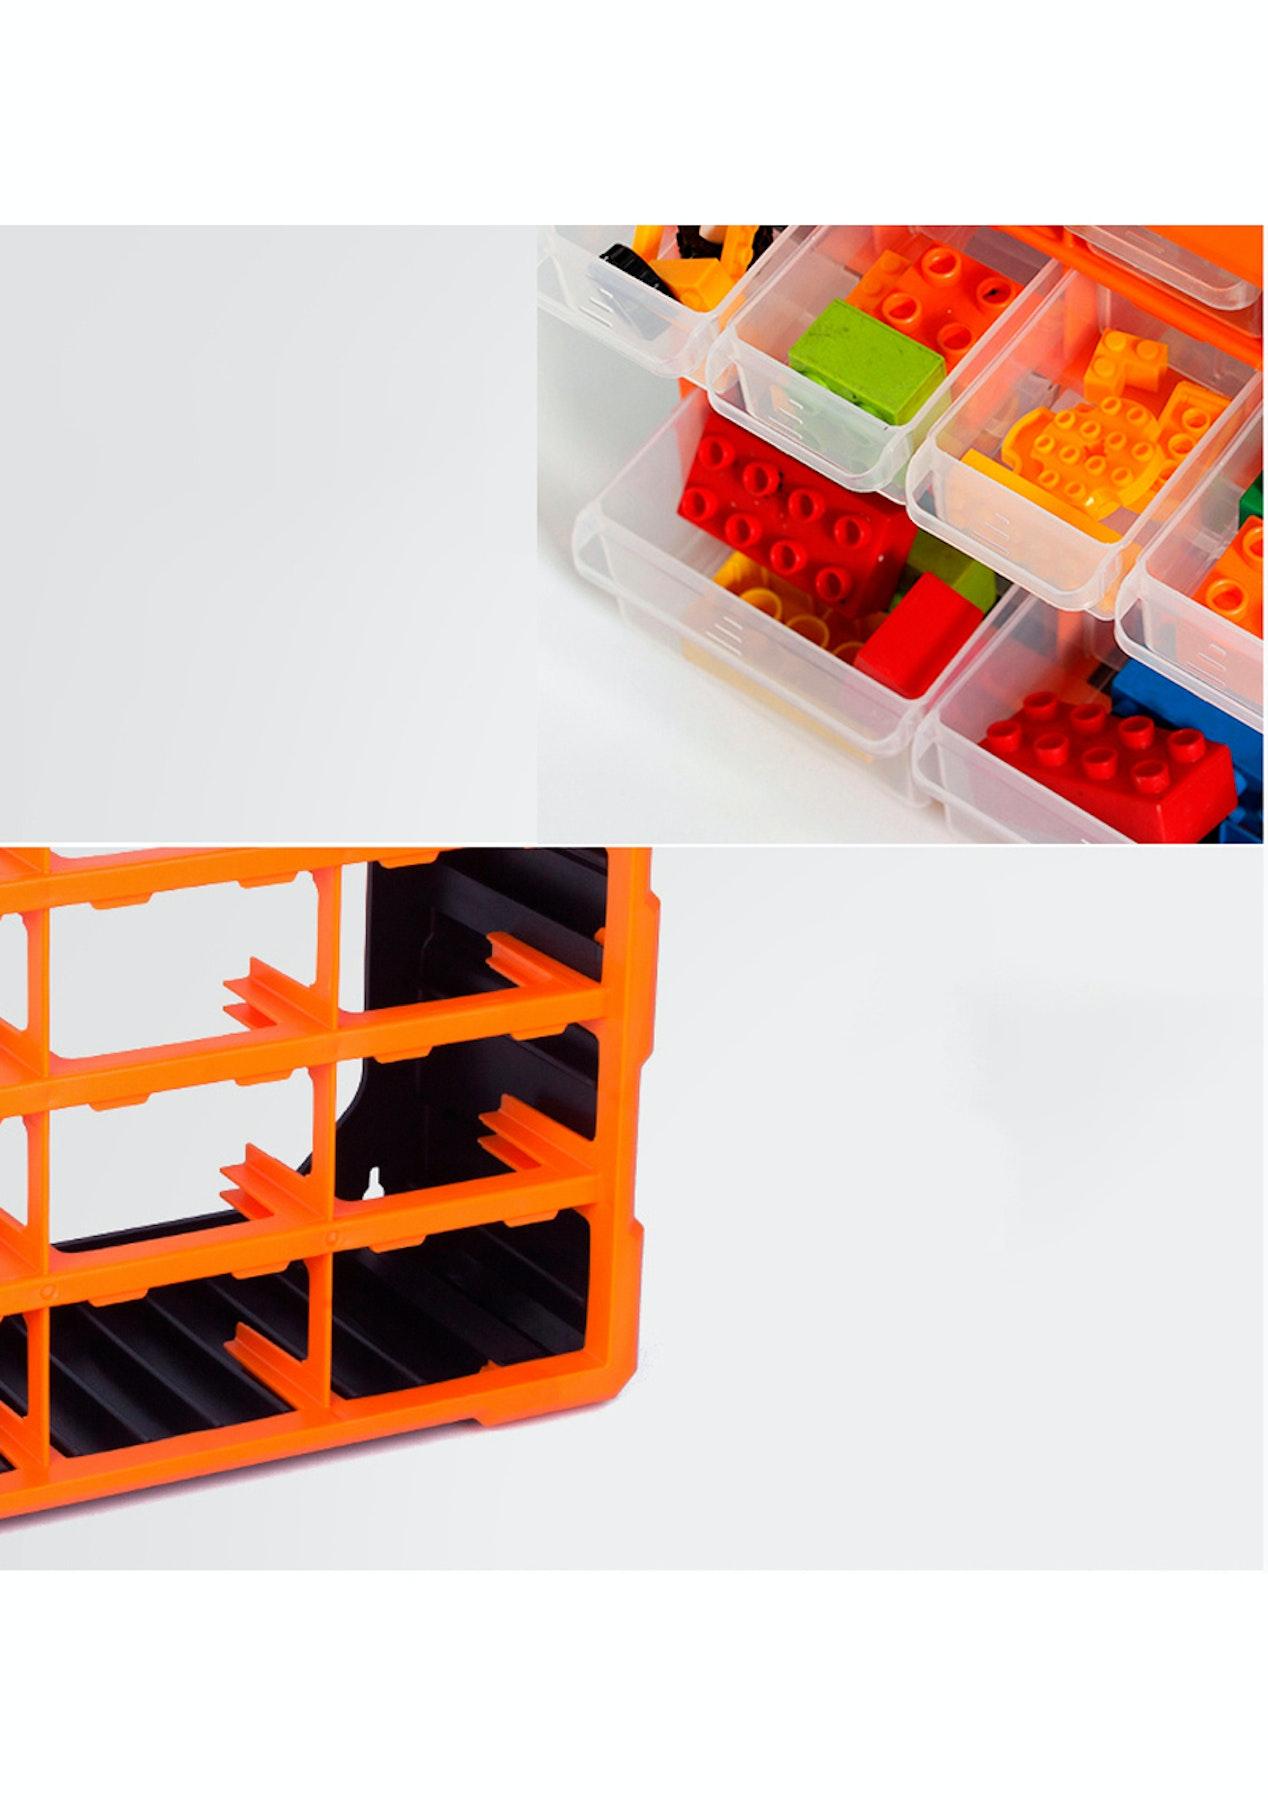 60 Drawer Plastic Parts Organizer Storage Box